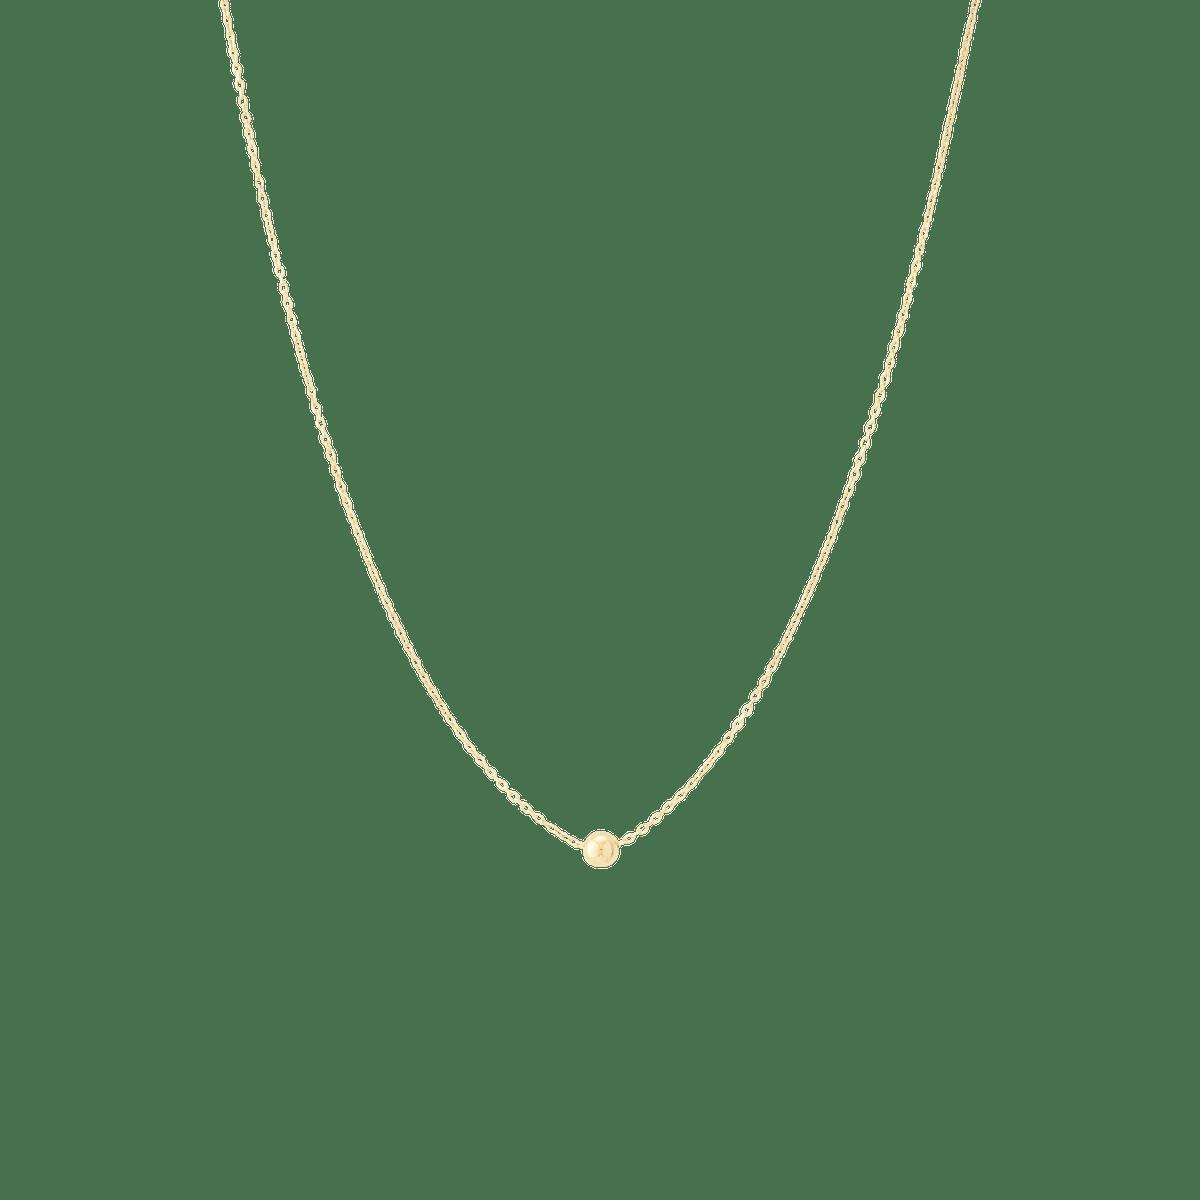 Single Sphere Necklace